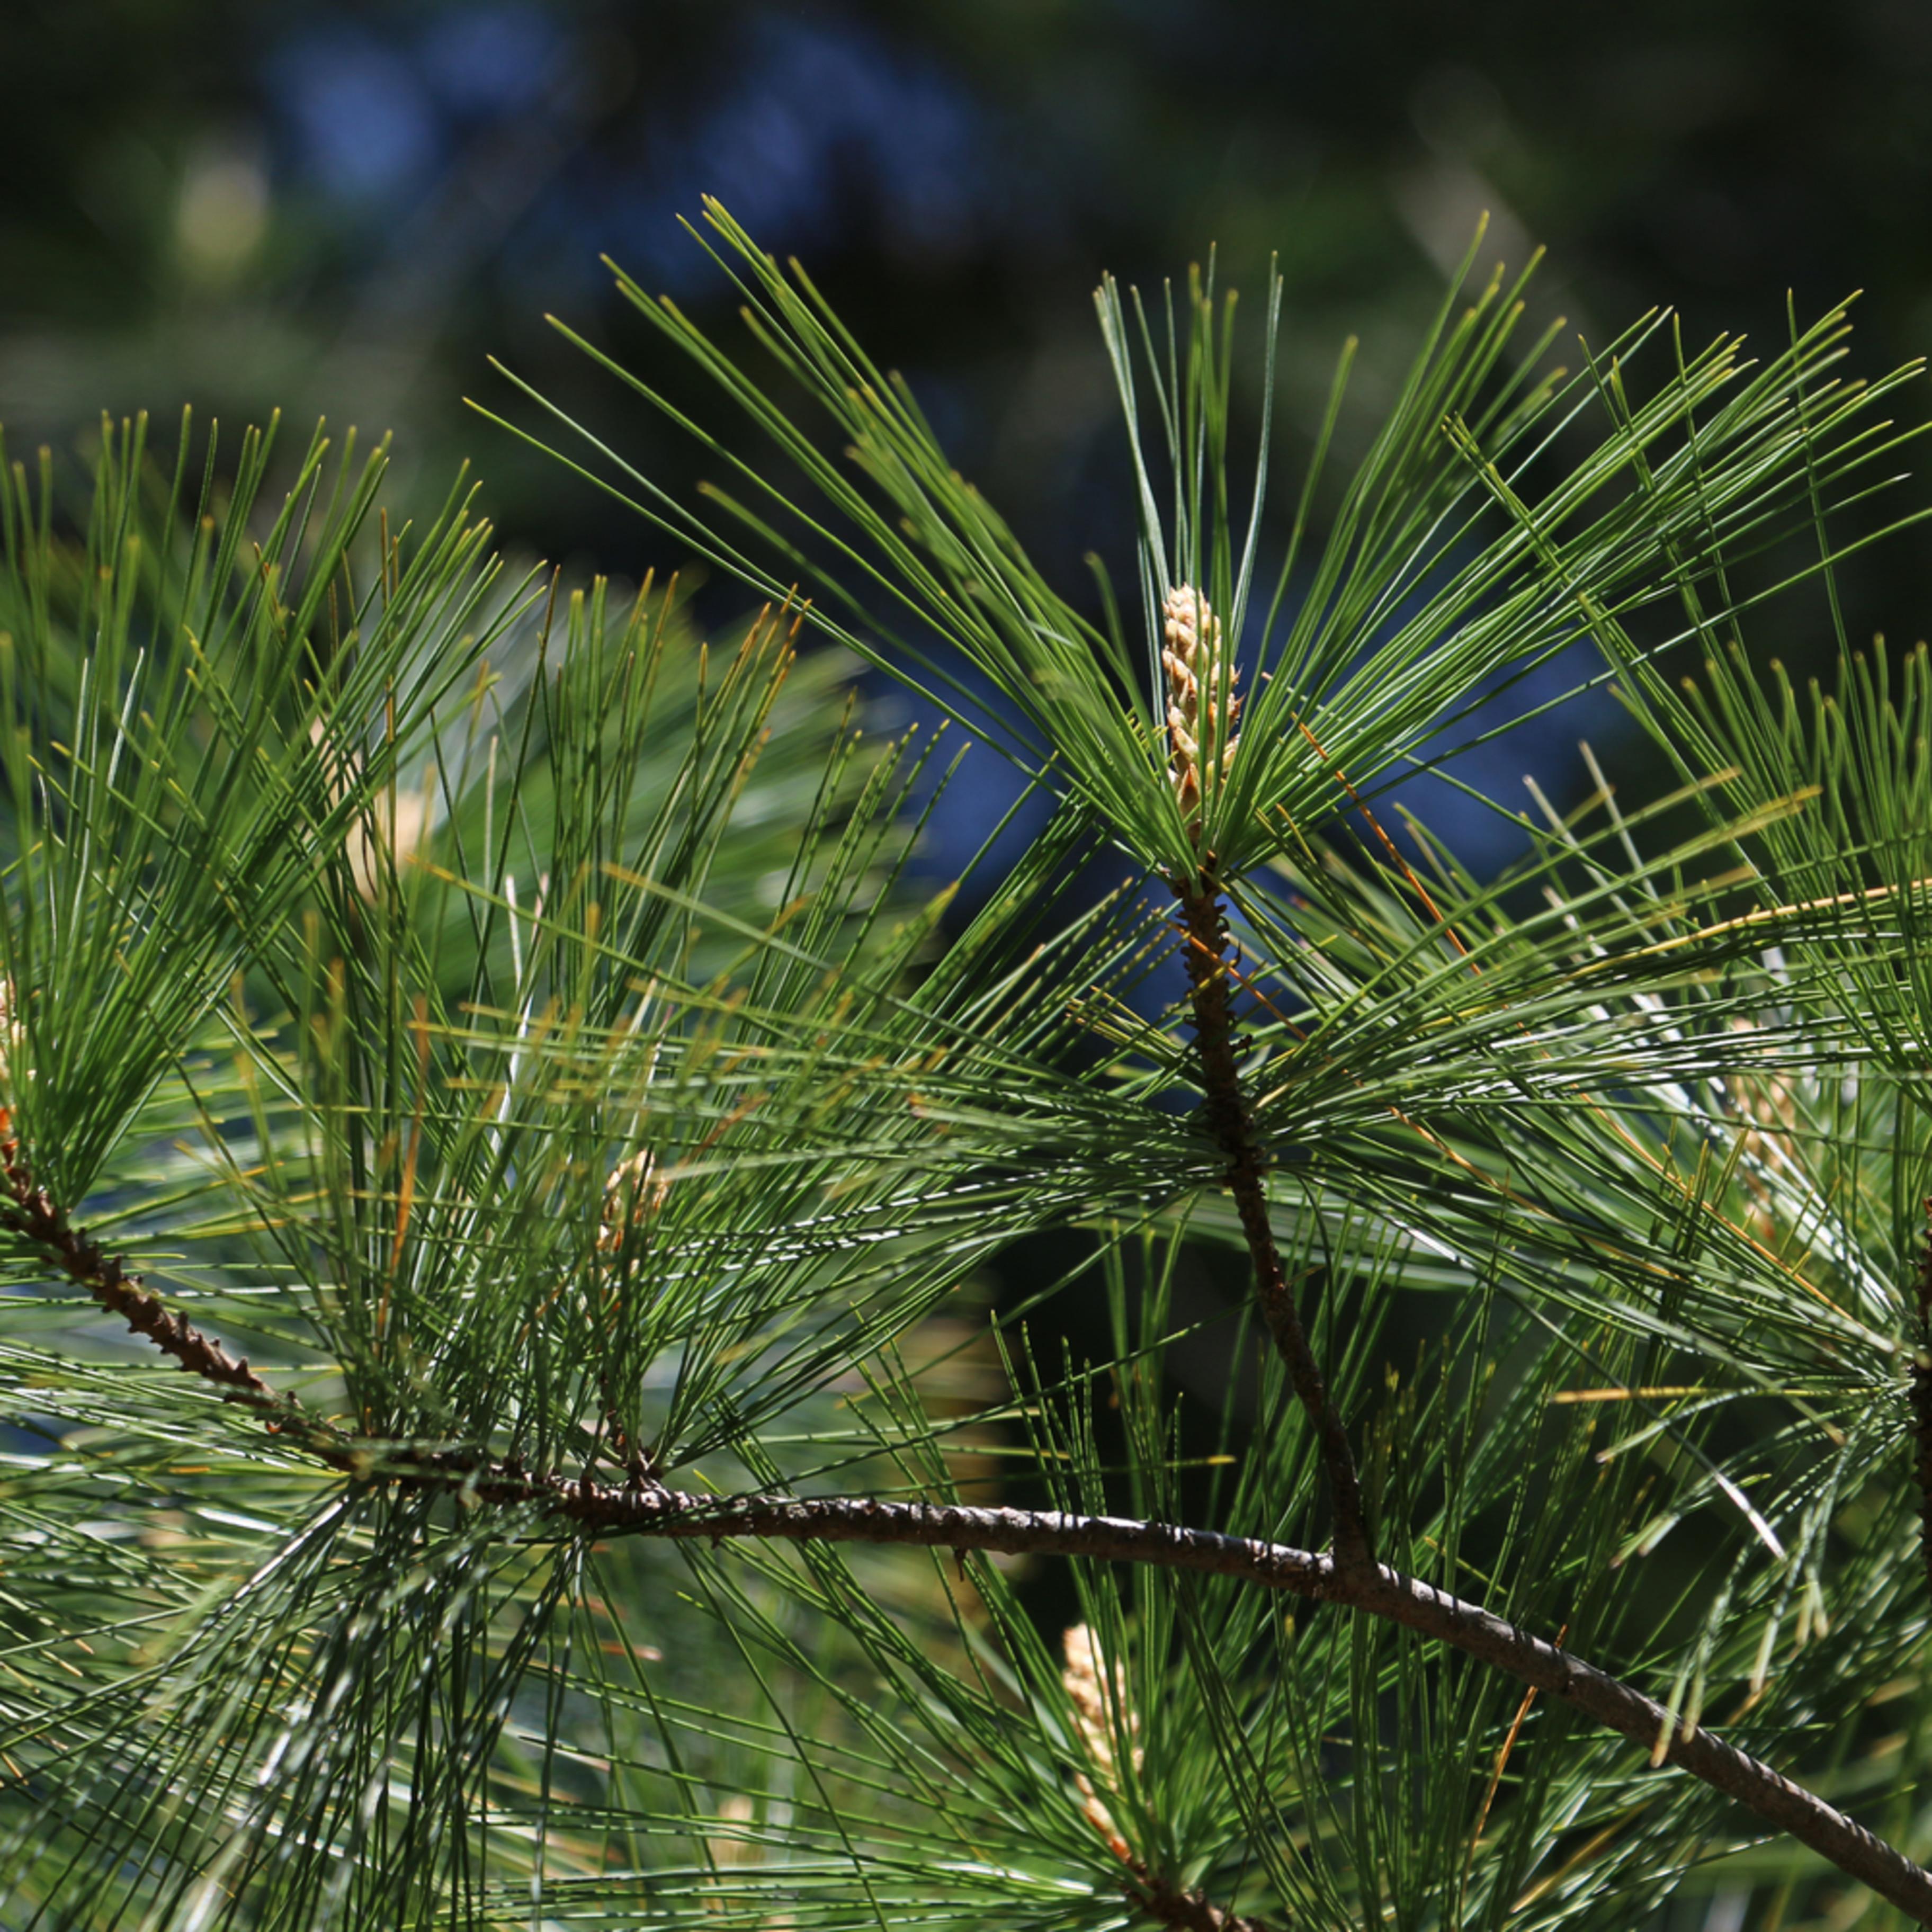 Elizabethmoore pineneedles 3617 gwcbjb